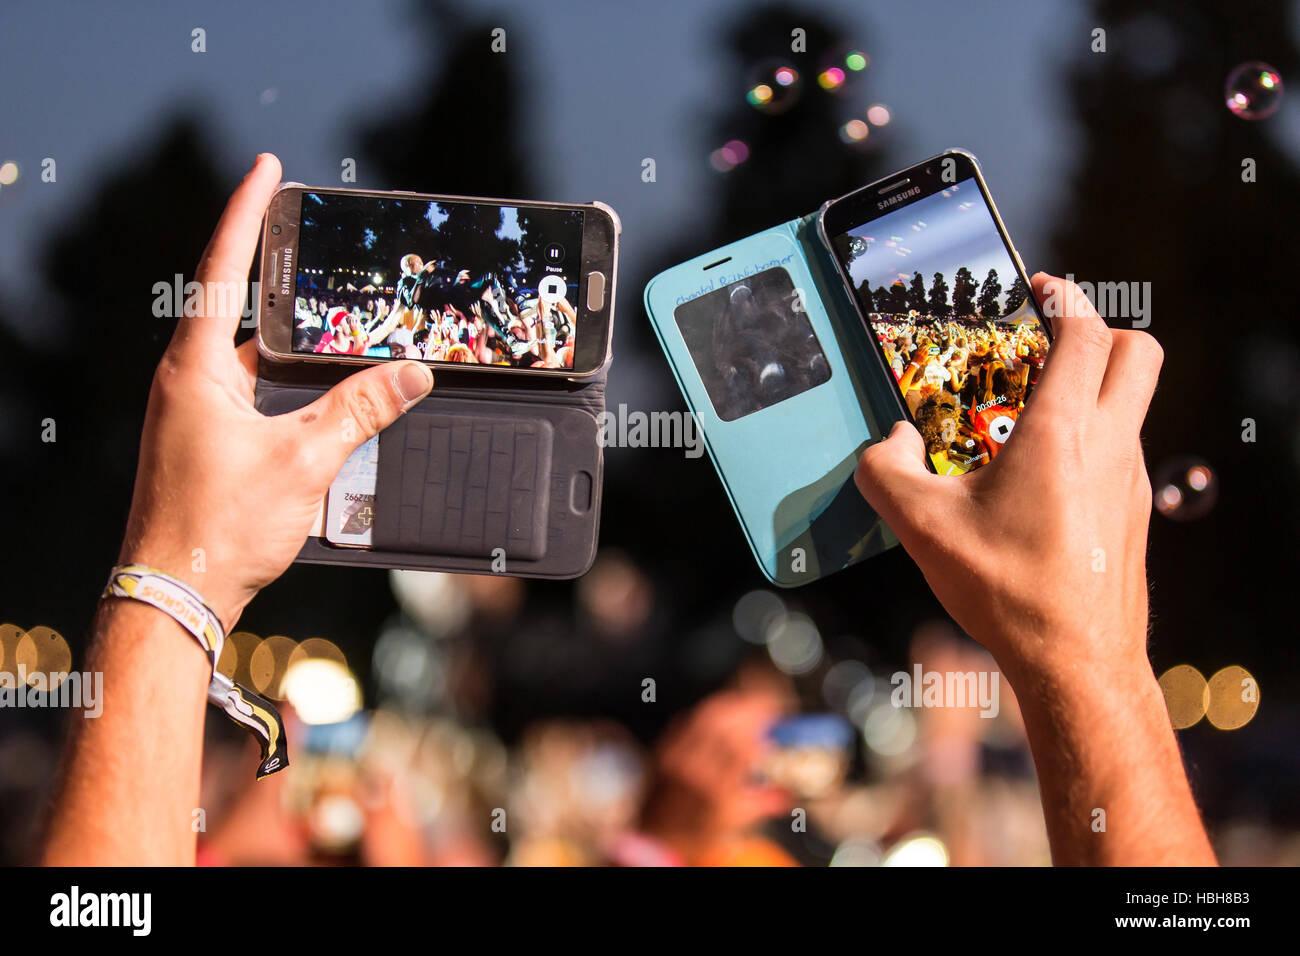 Skunk Anansie - Ventilatore macht Foto mit Iphone Immagini Stock